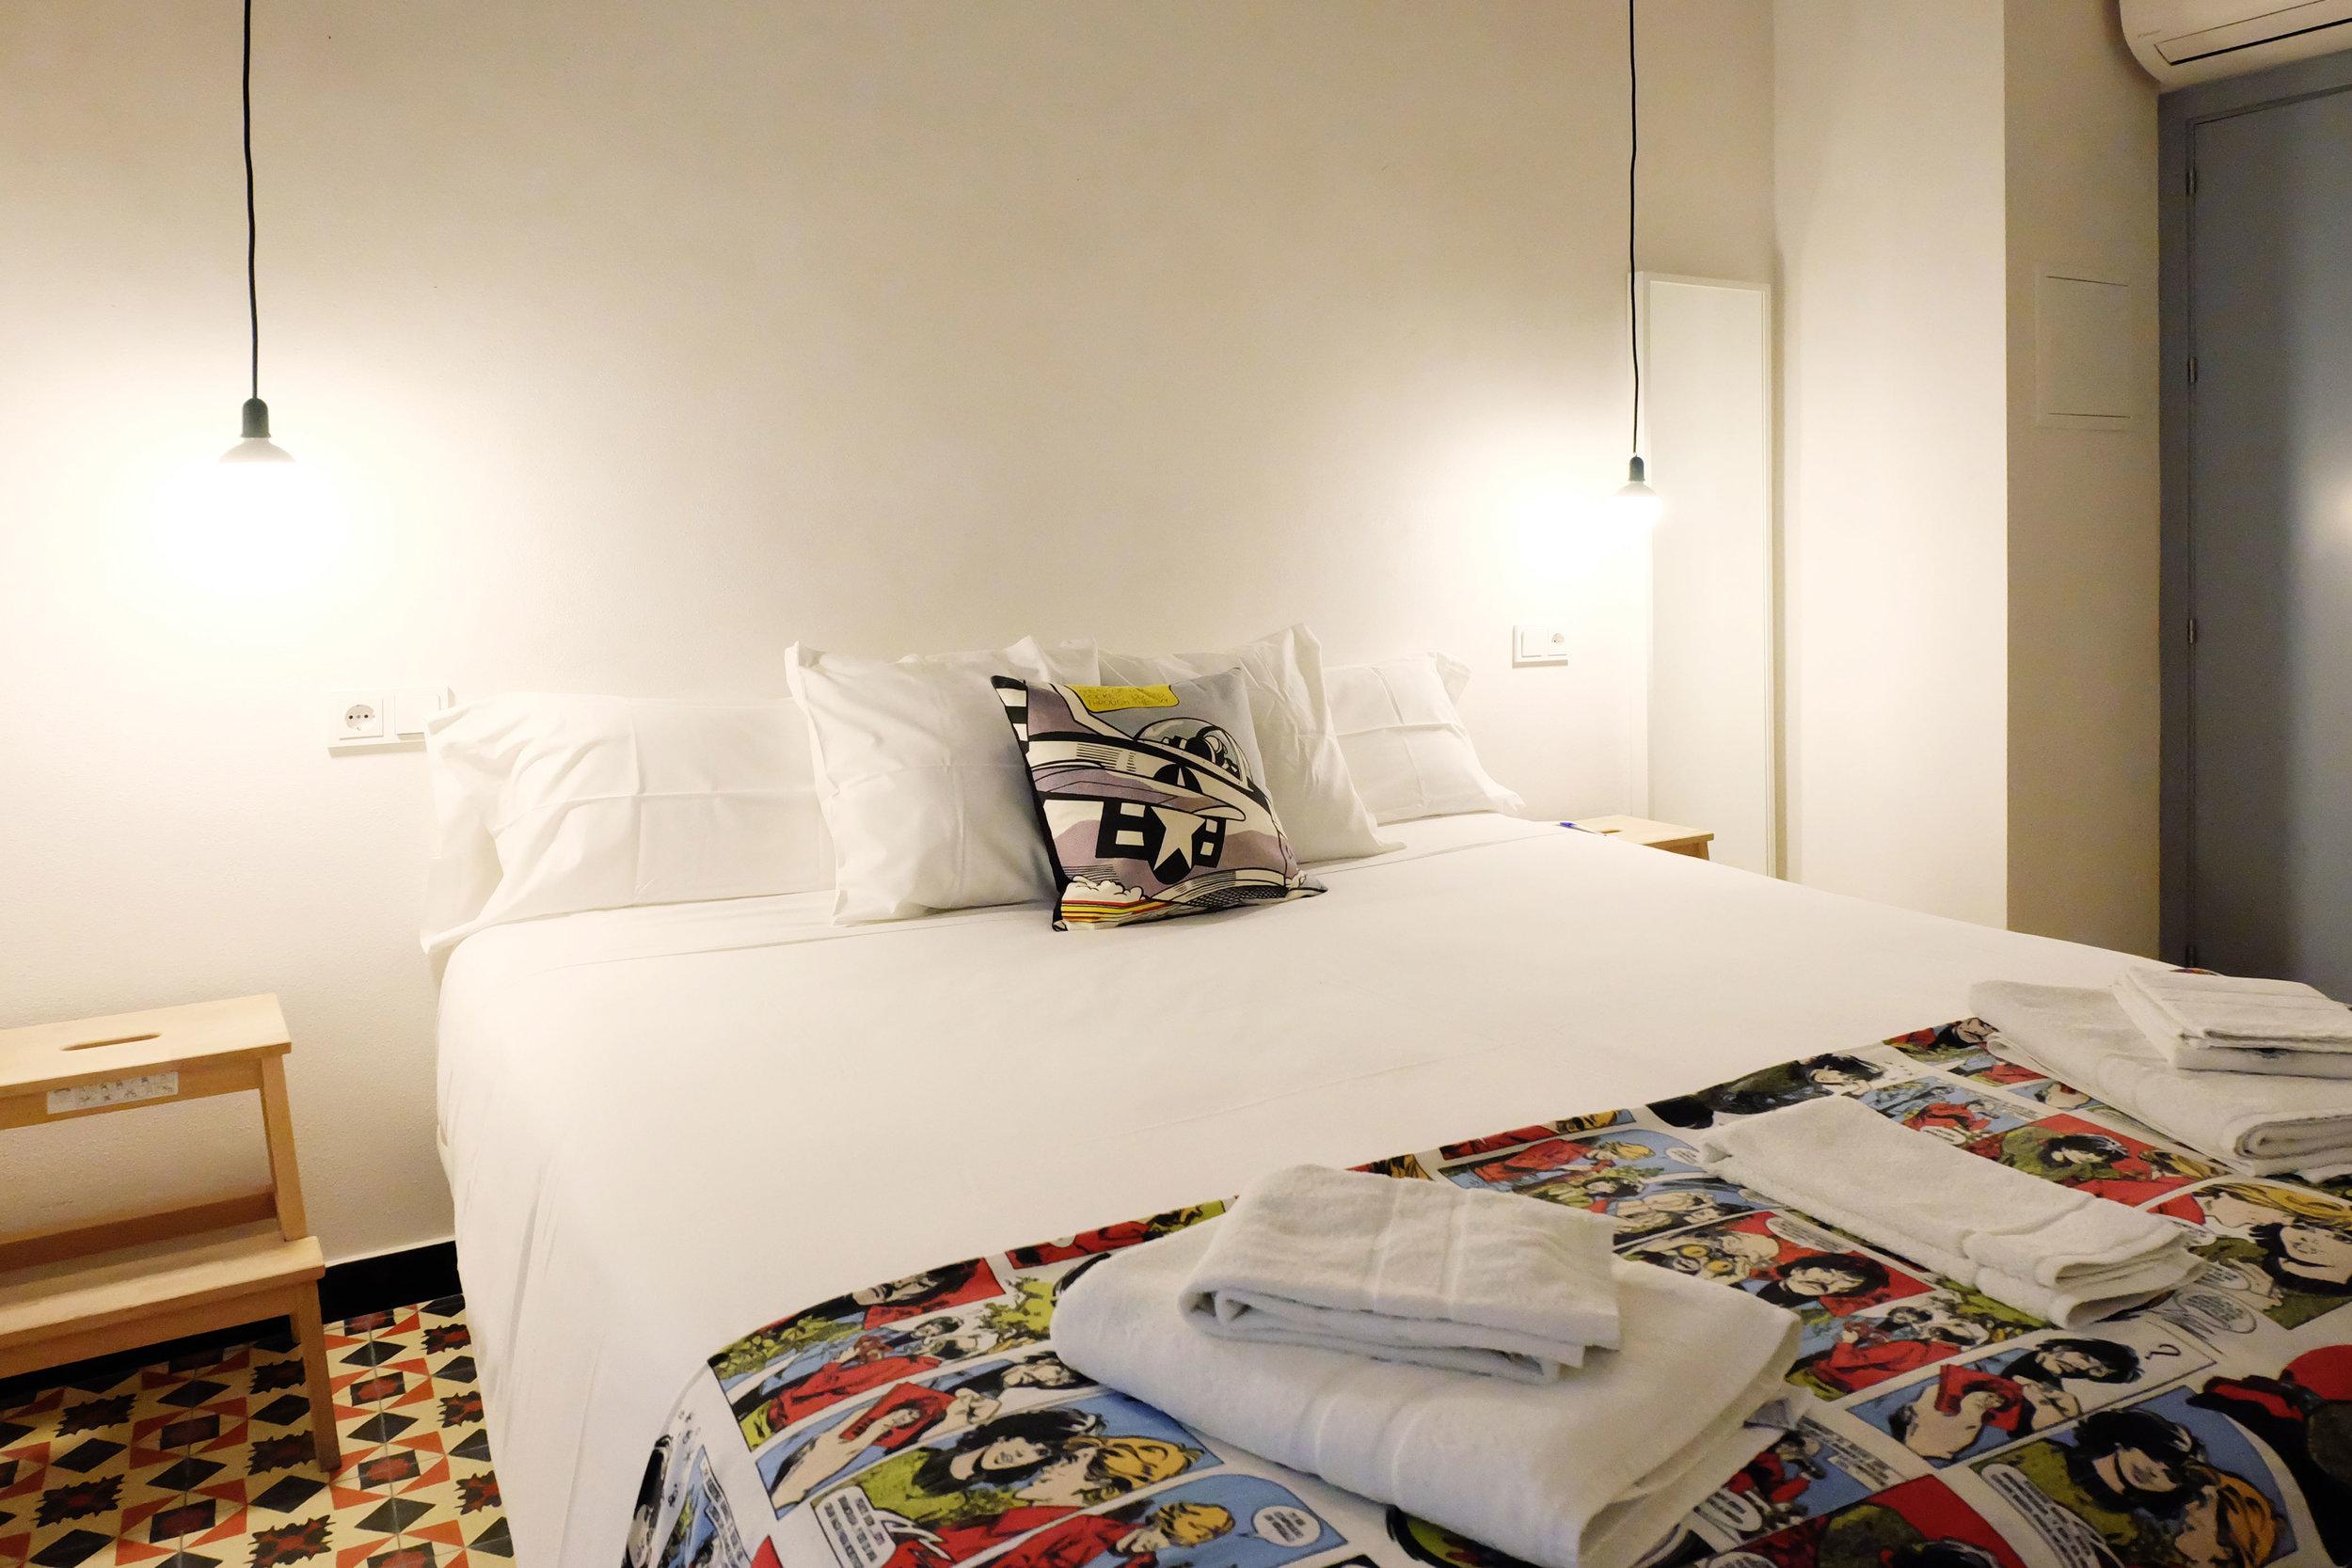 Hotel-Casa-de-Huespedes-Santa-Maria-Habitacion-1-9.jpg